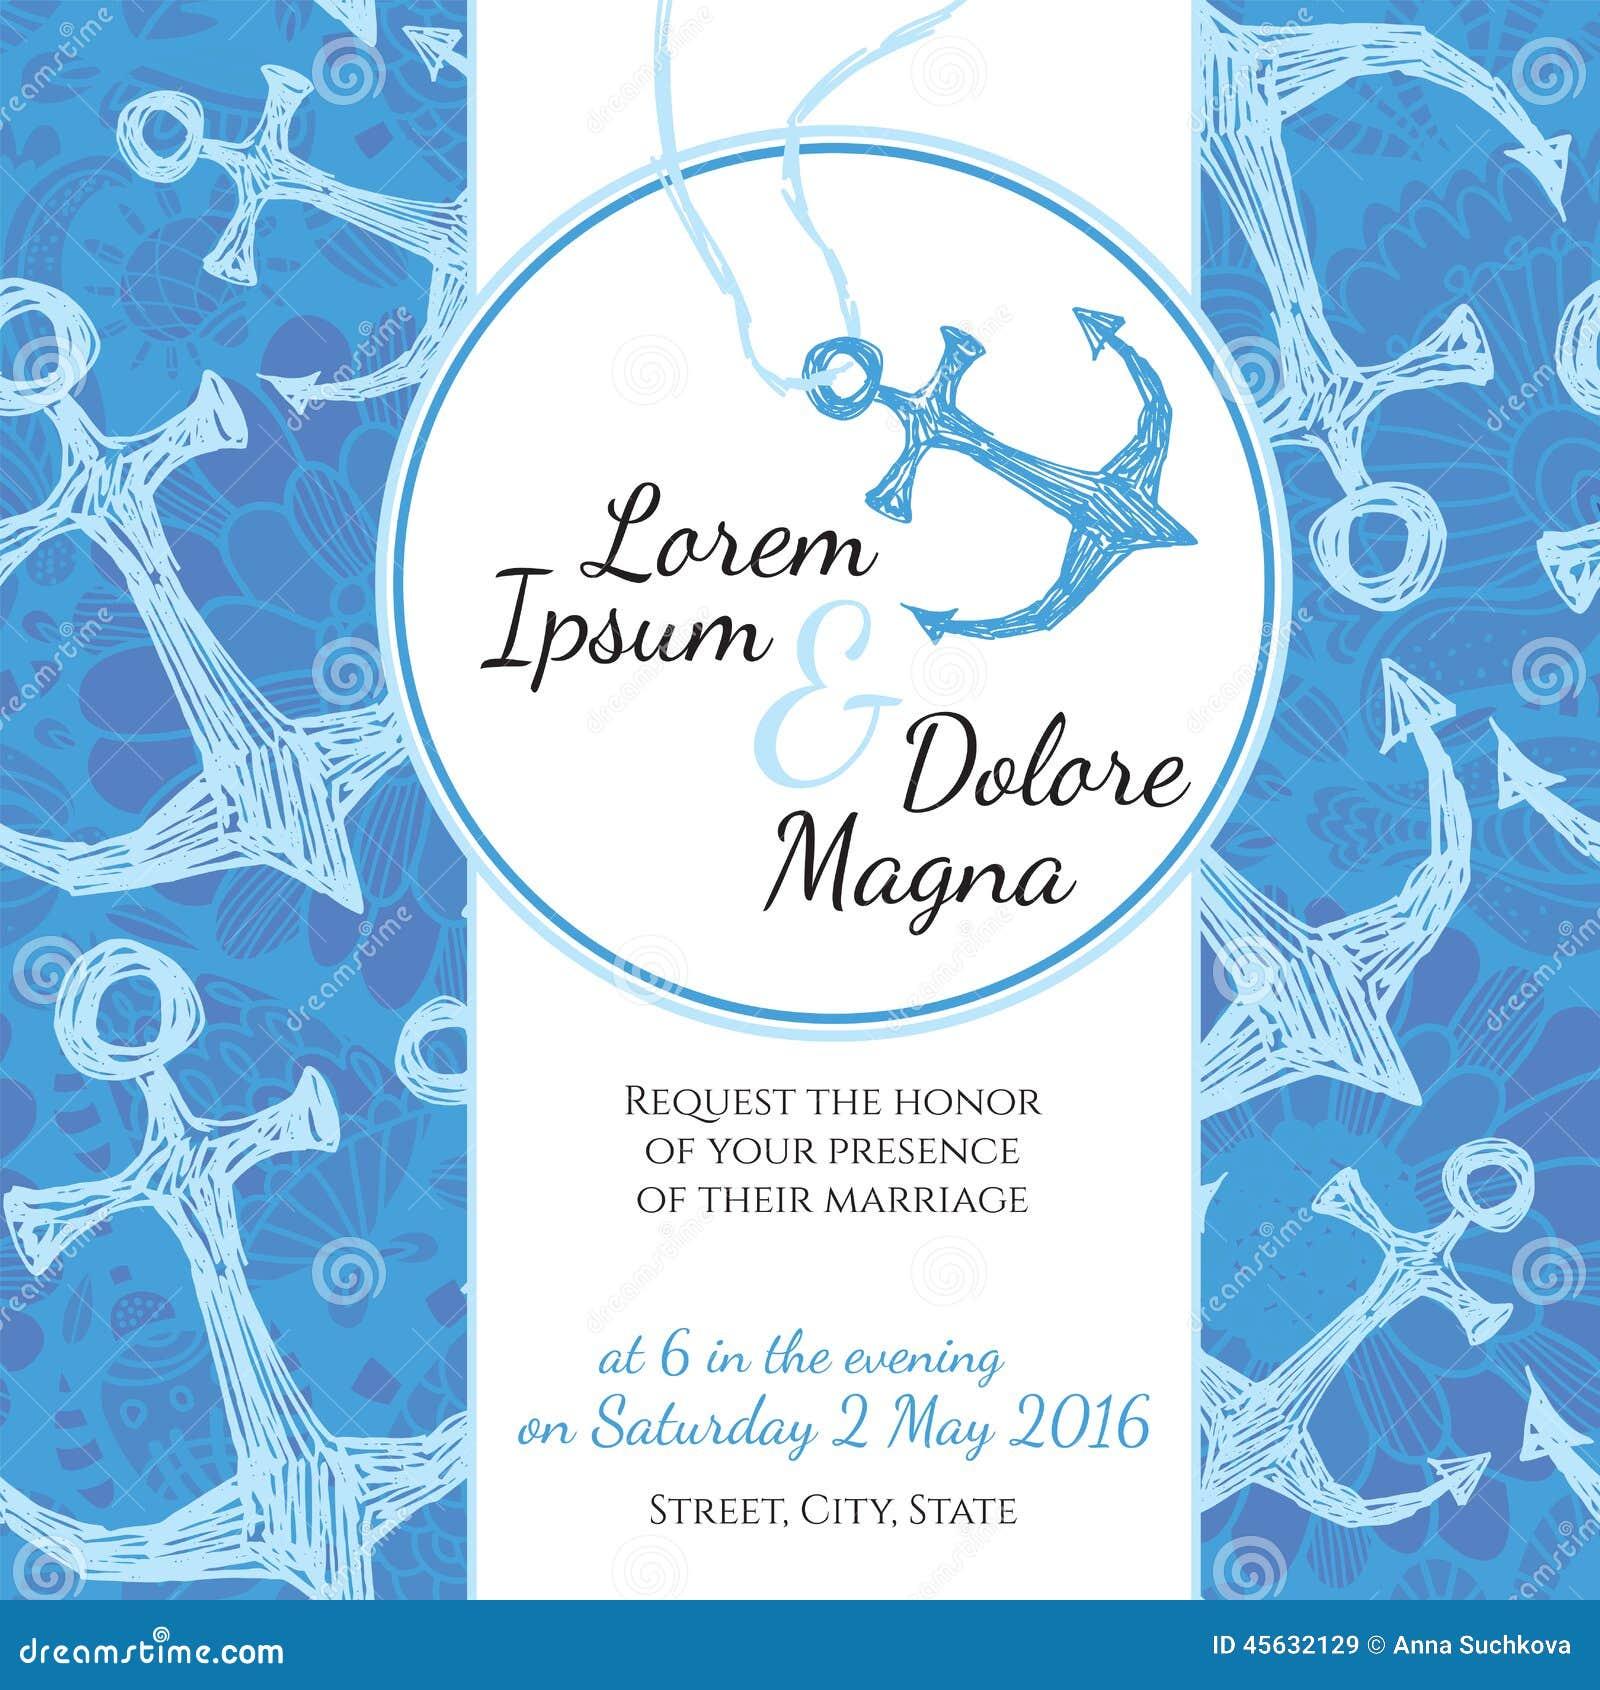 Carnival Ticket Invitation is awesome invitations design